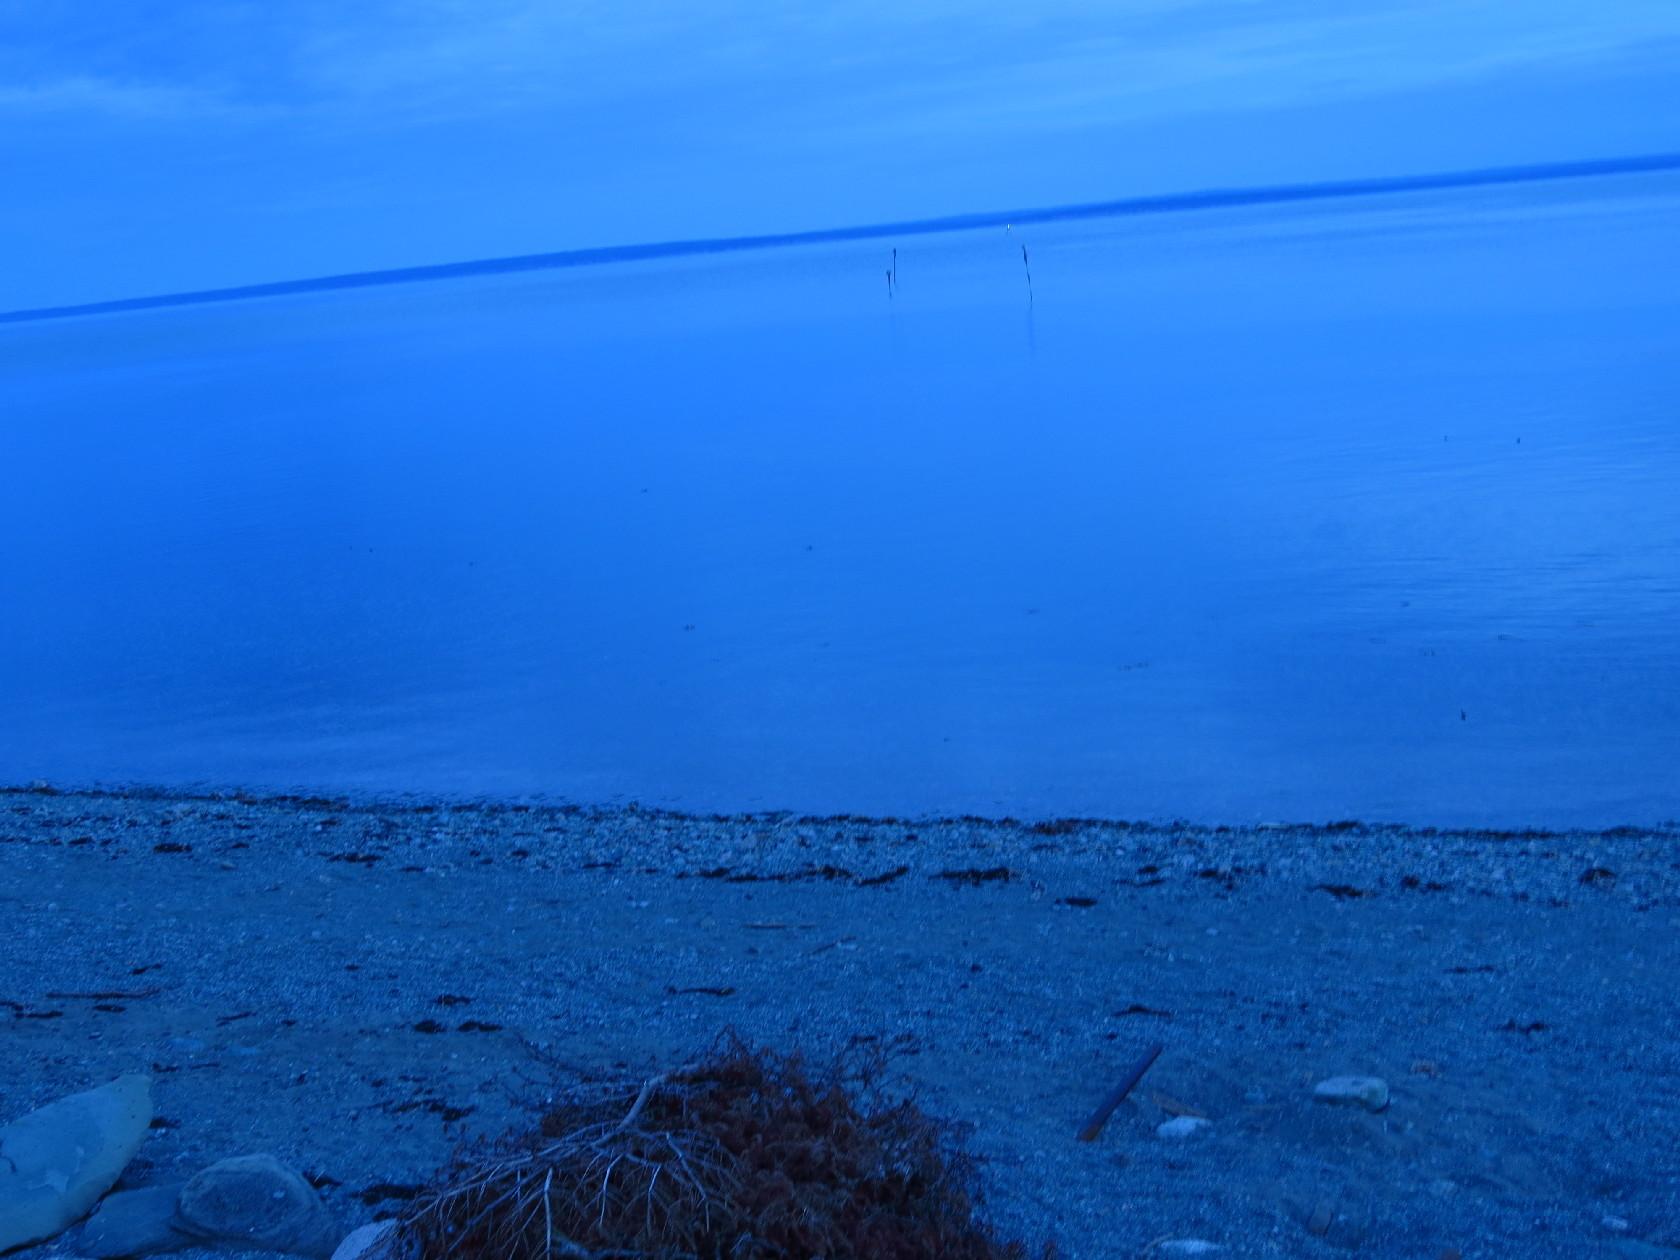 Tide has risen. Poles almost submerged, Alma